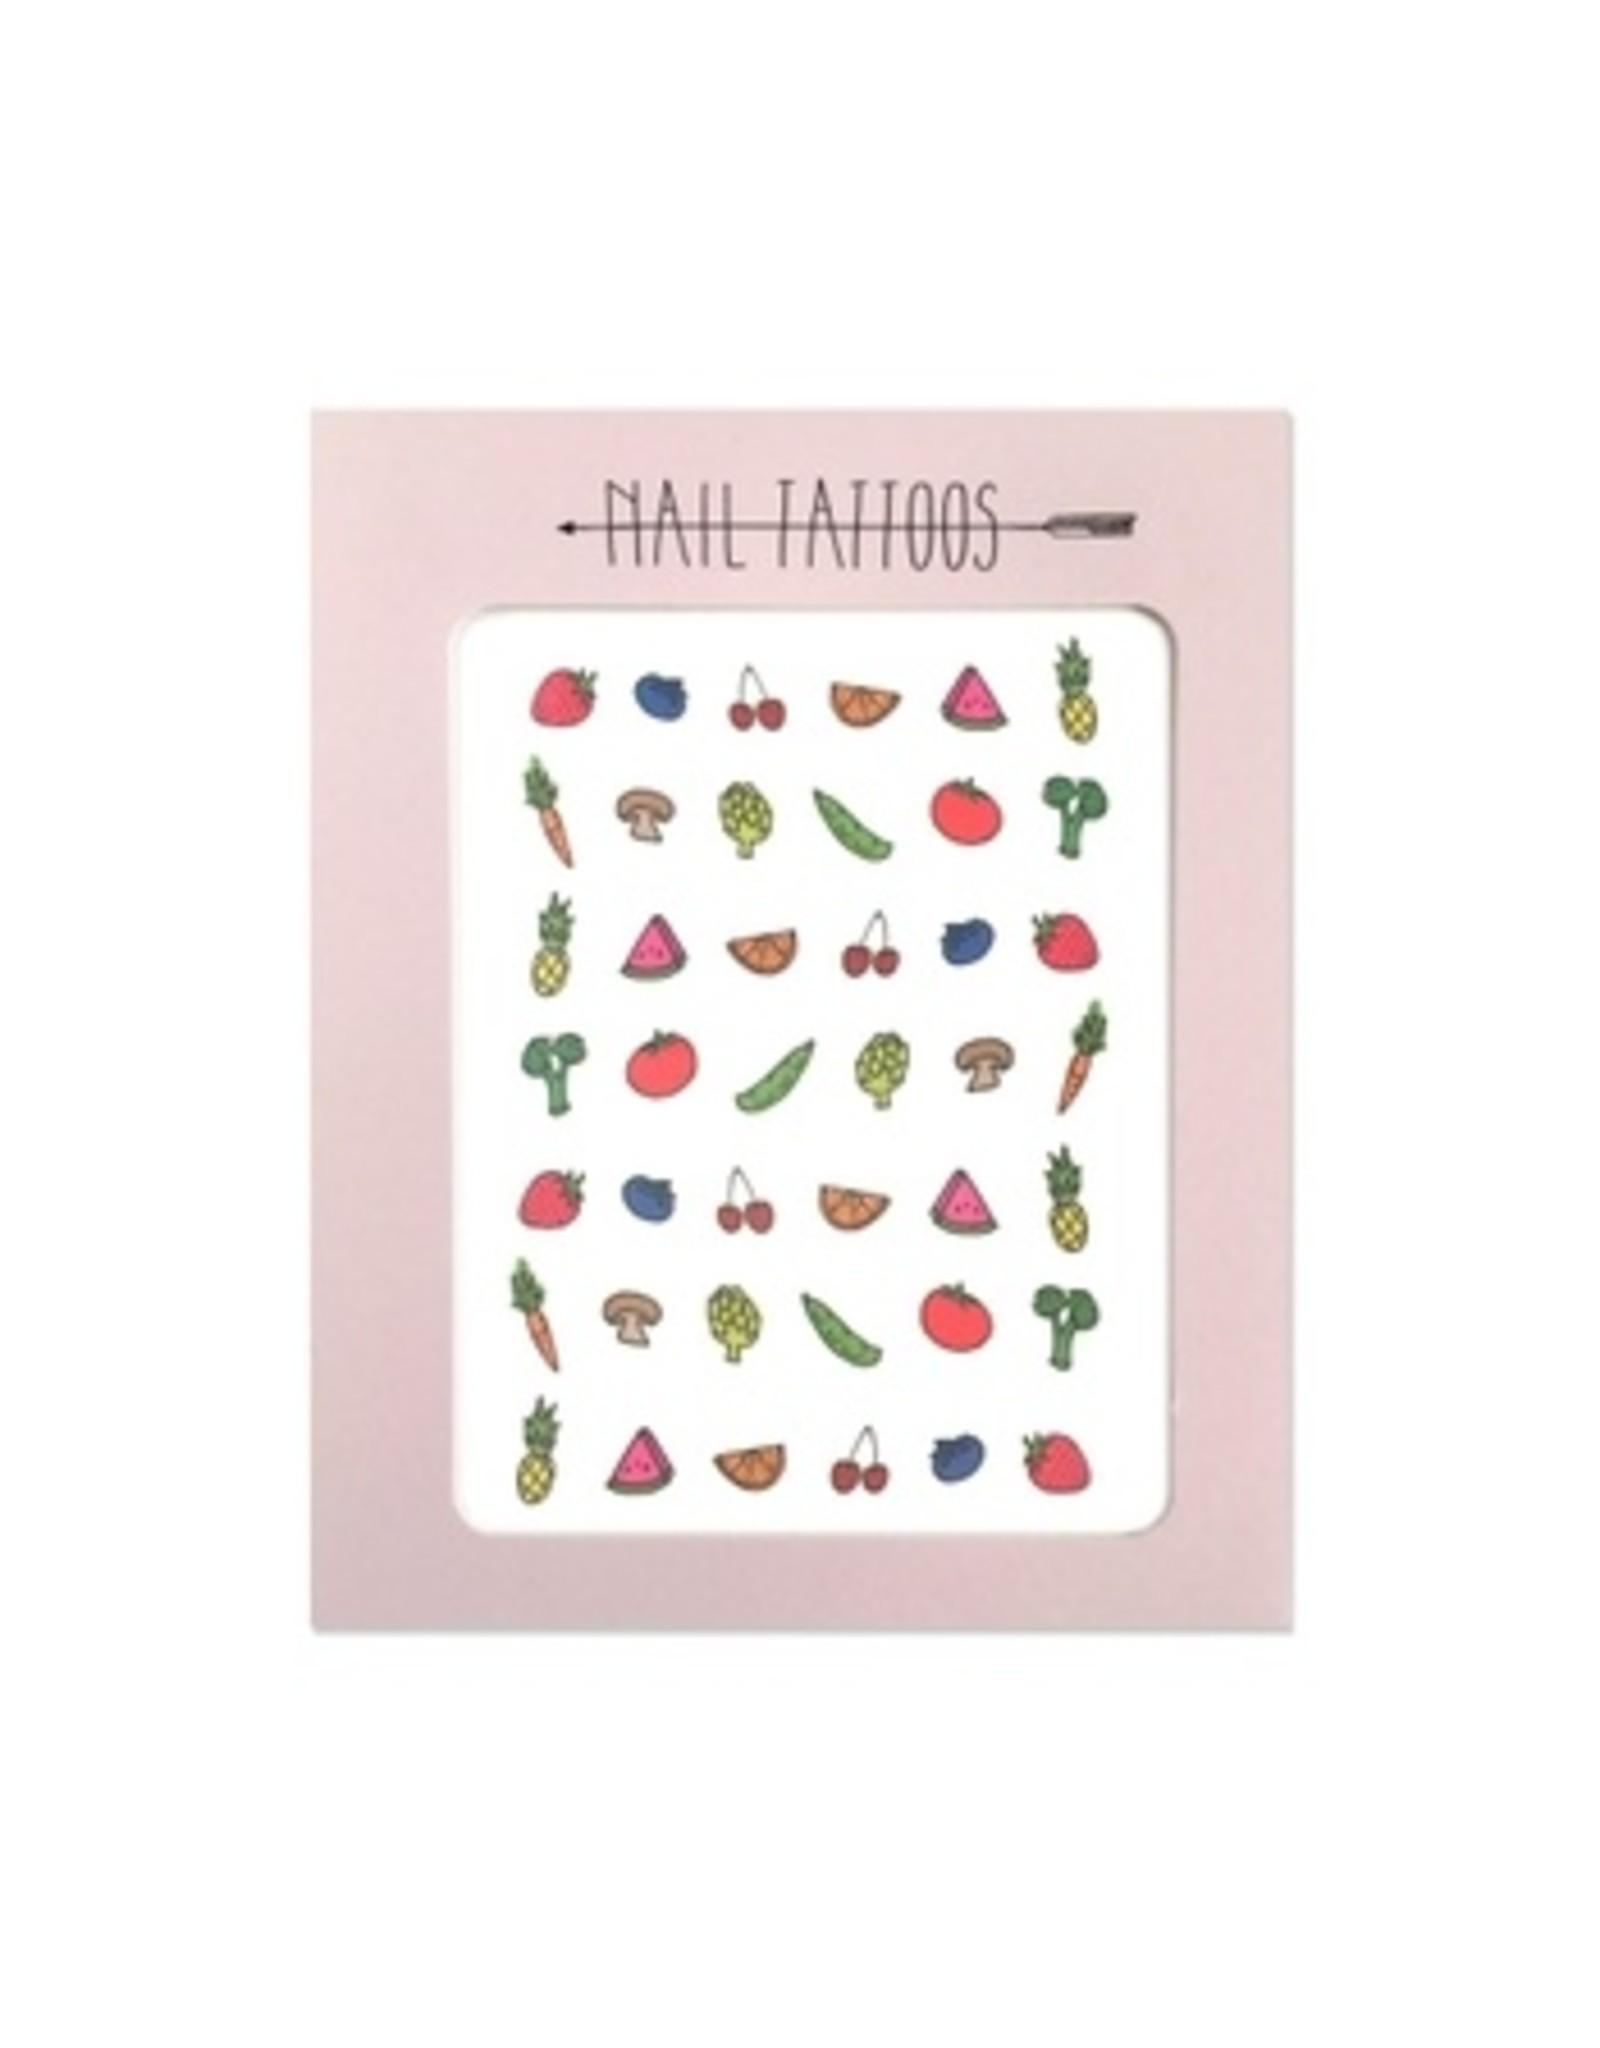 Hartland Brooklyn Fruits & Veggies Nail Tattoos